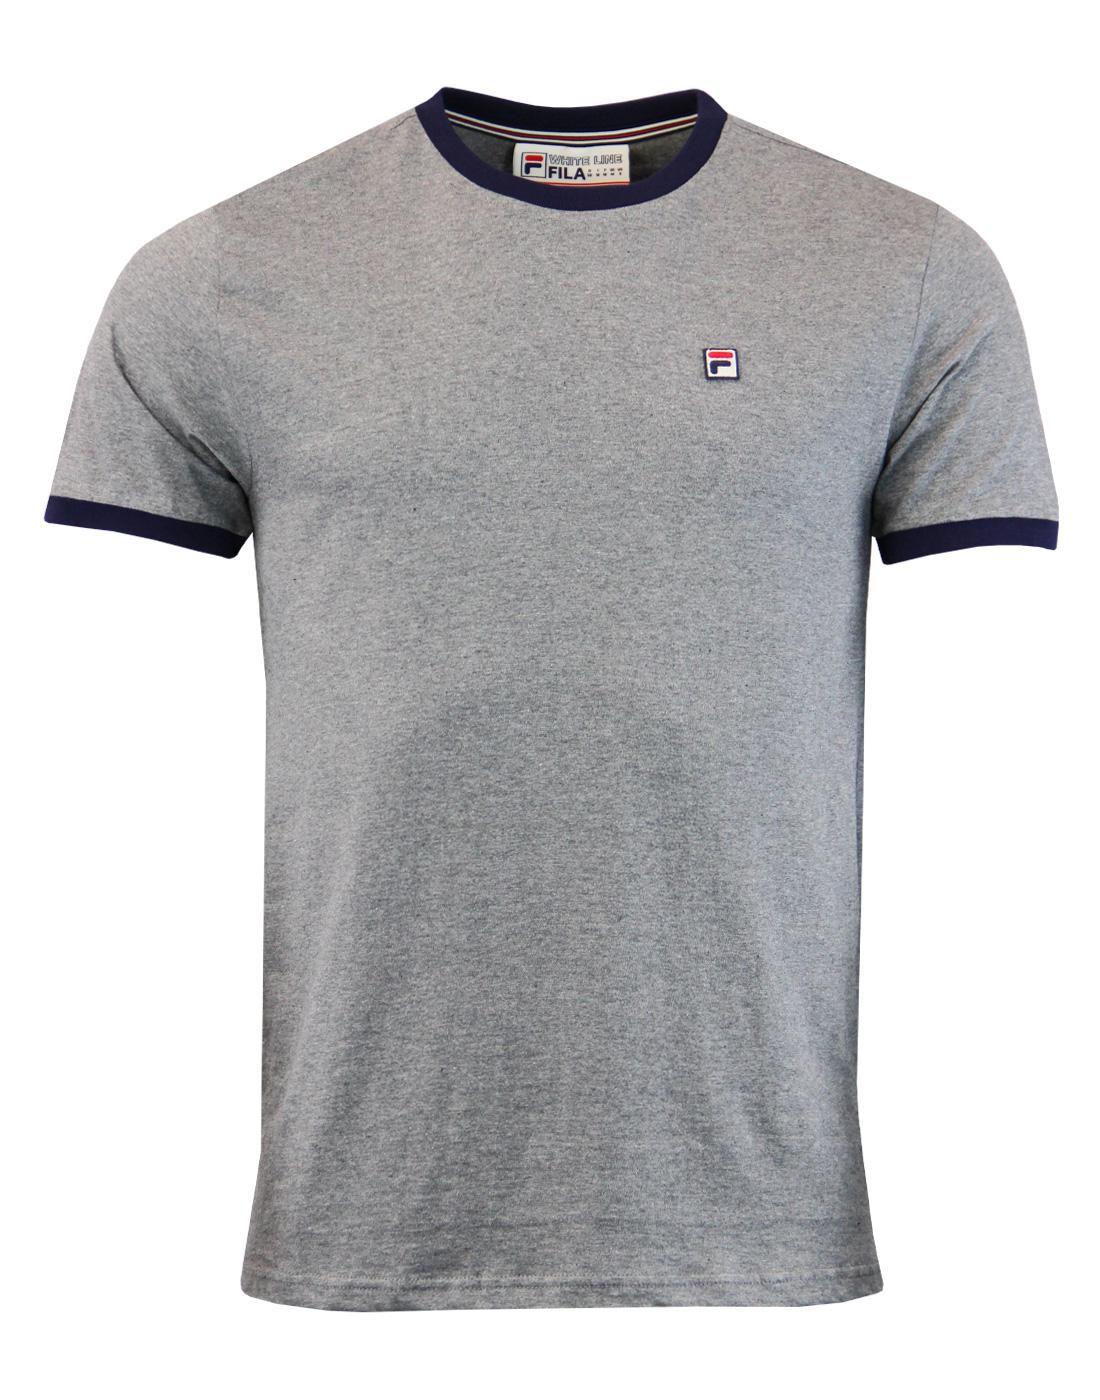 Marconi FILA VINTAGE Retro Mod Ringer T-Shirt GREY